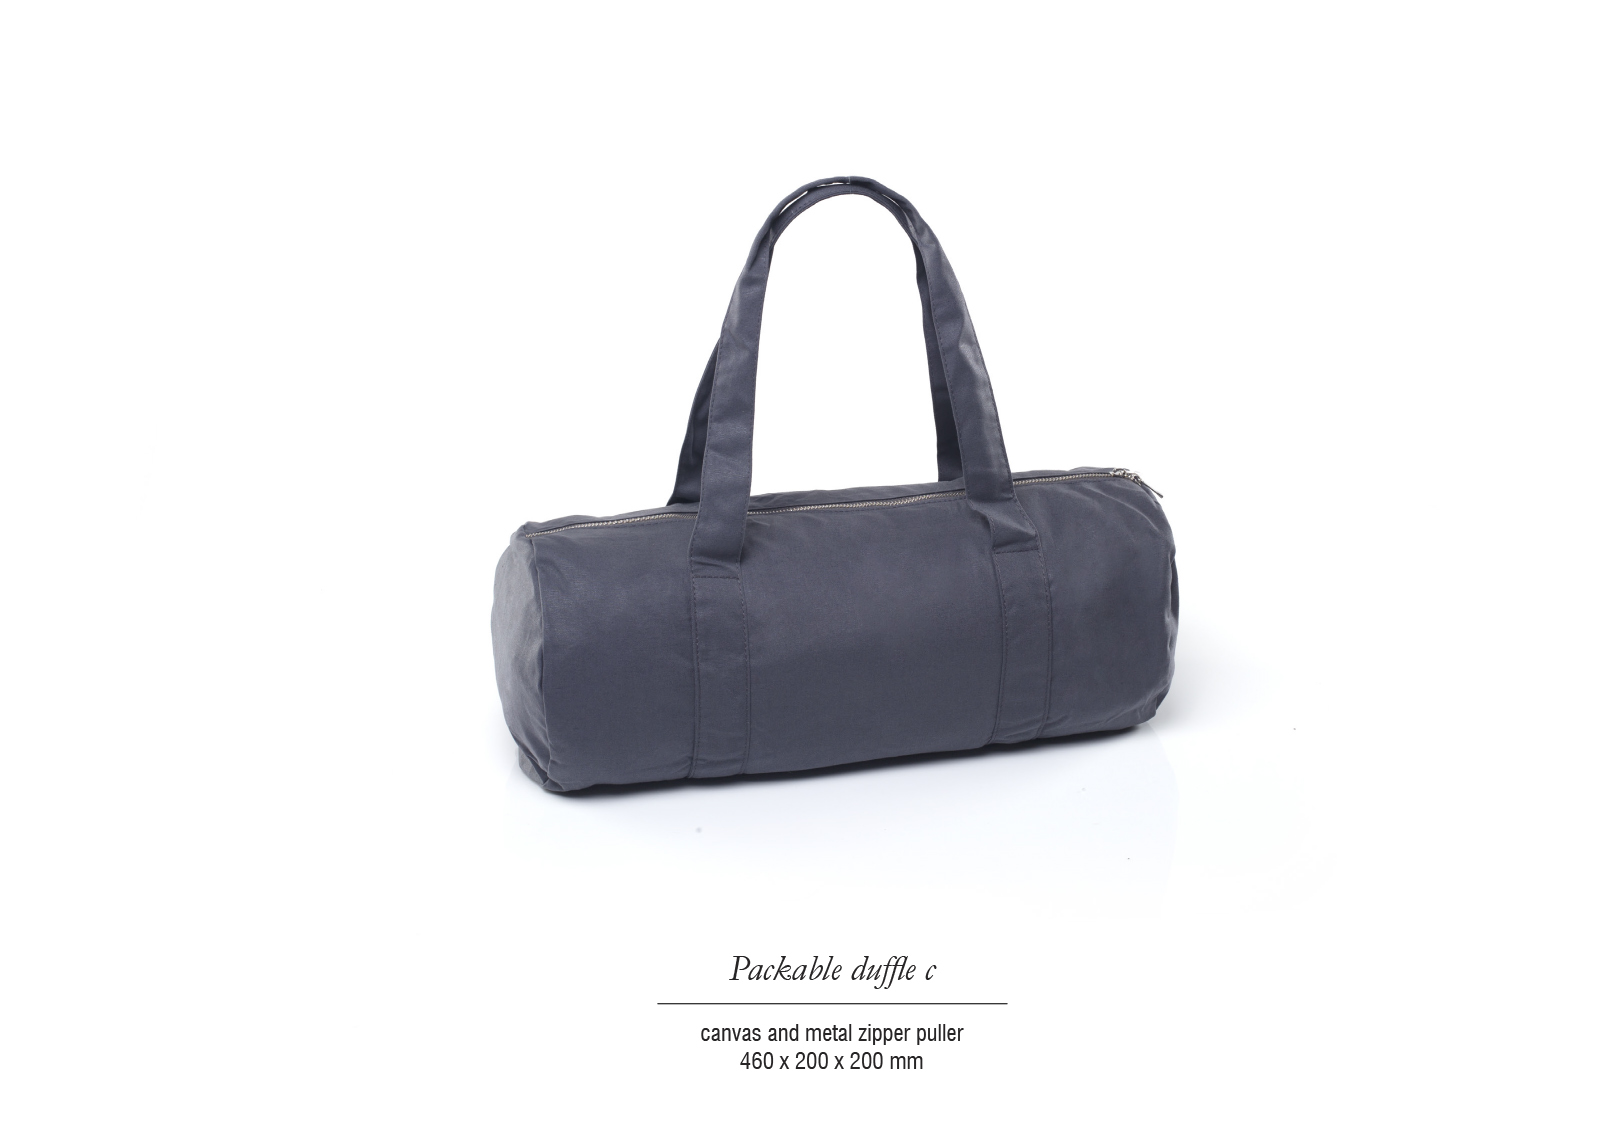 Amenity bags catalogue 2016_SHcollection_V6 102.jpg